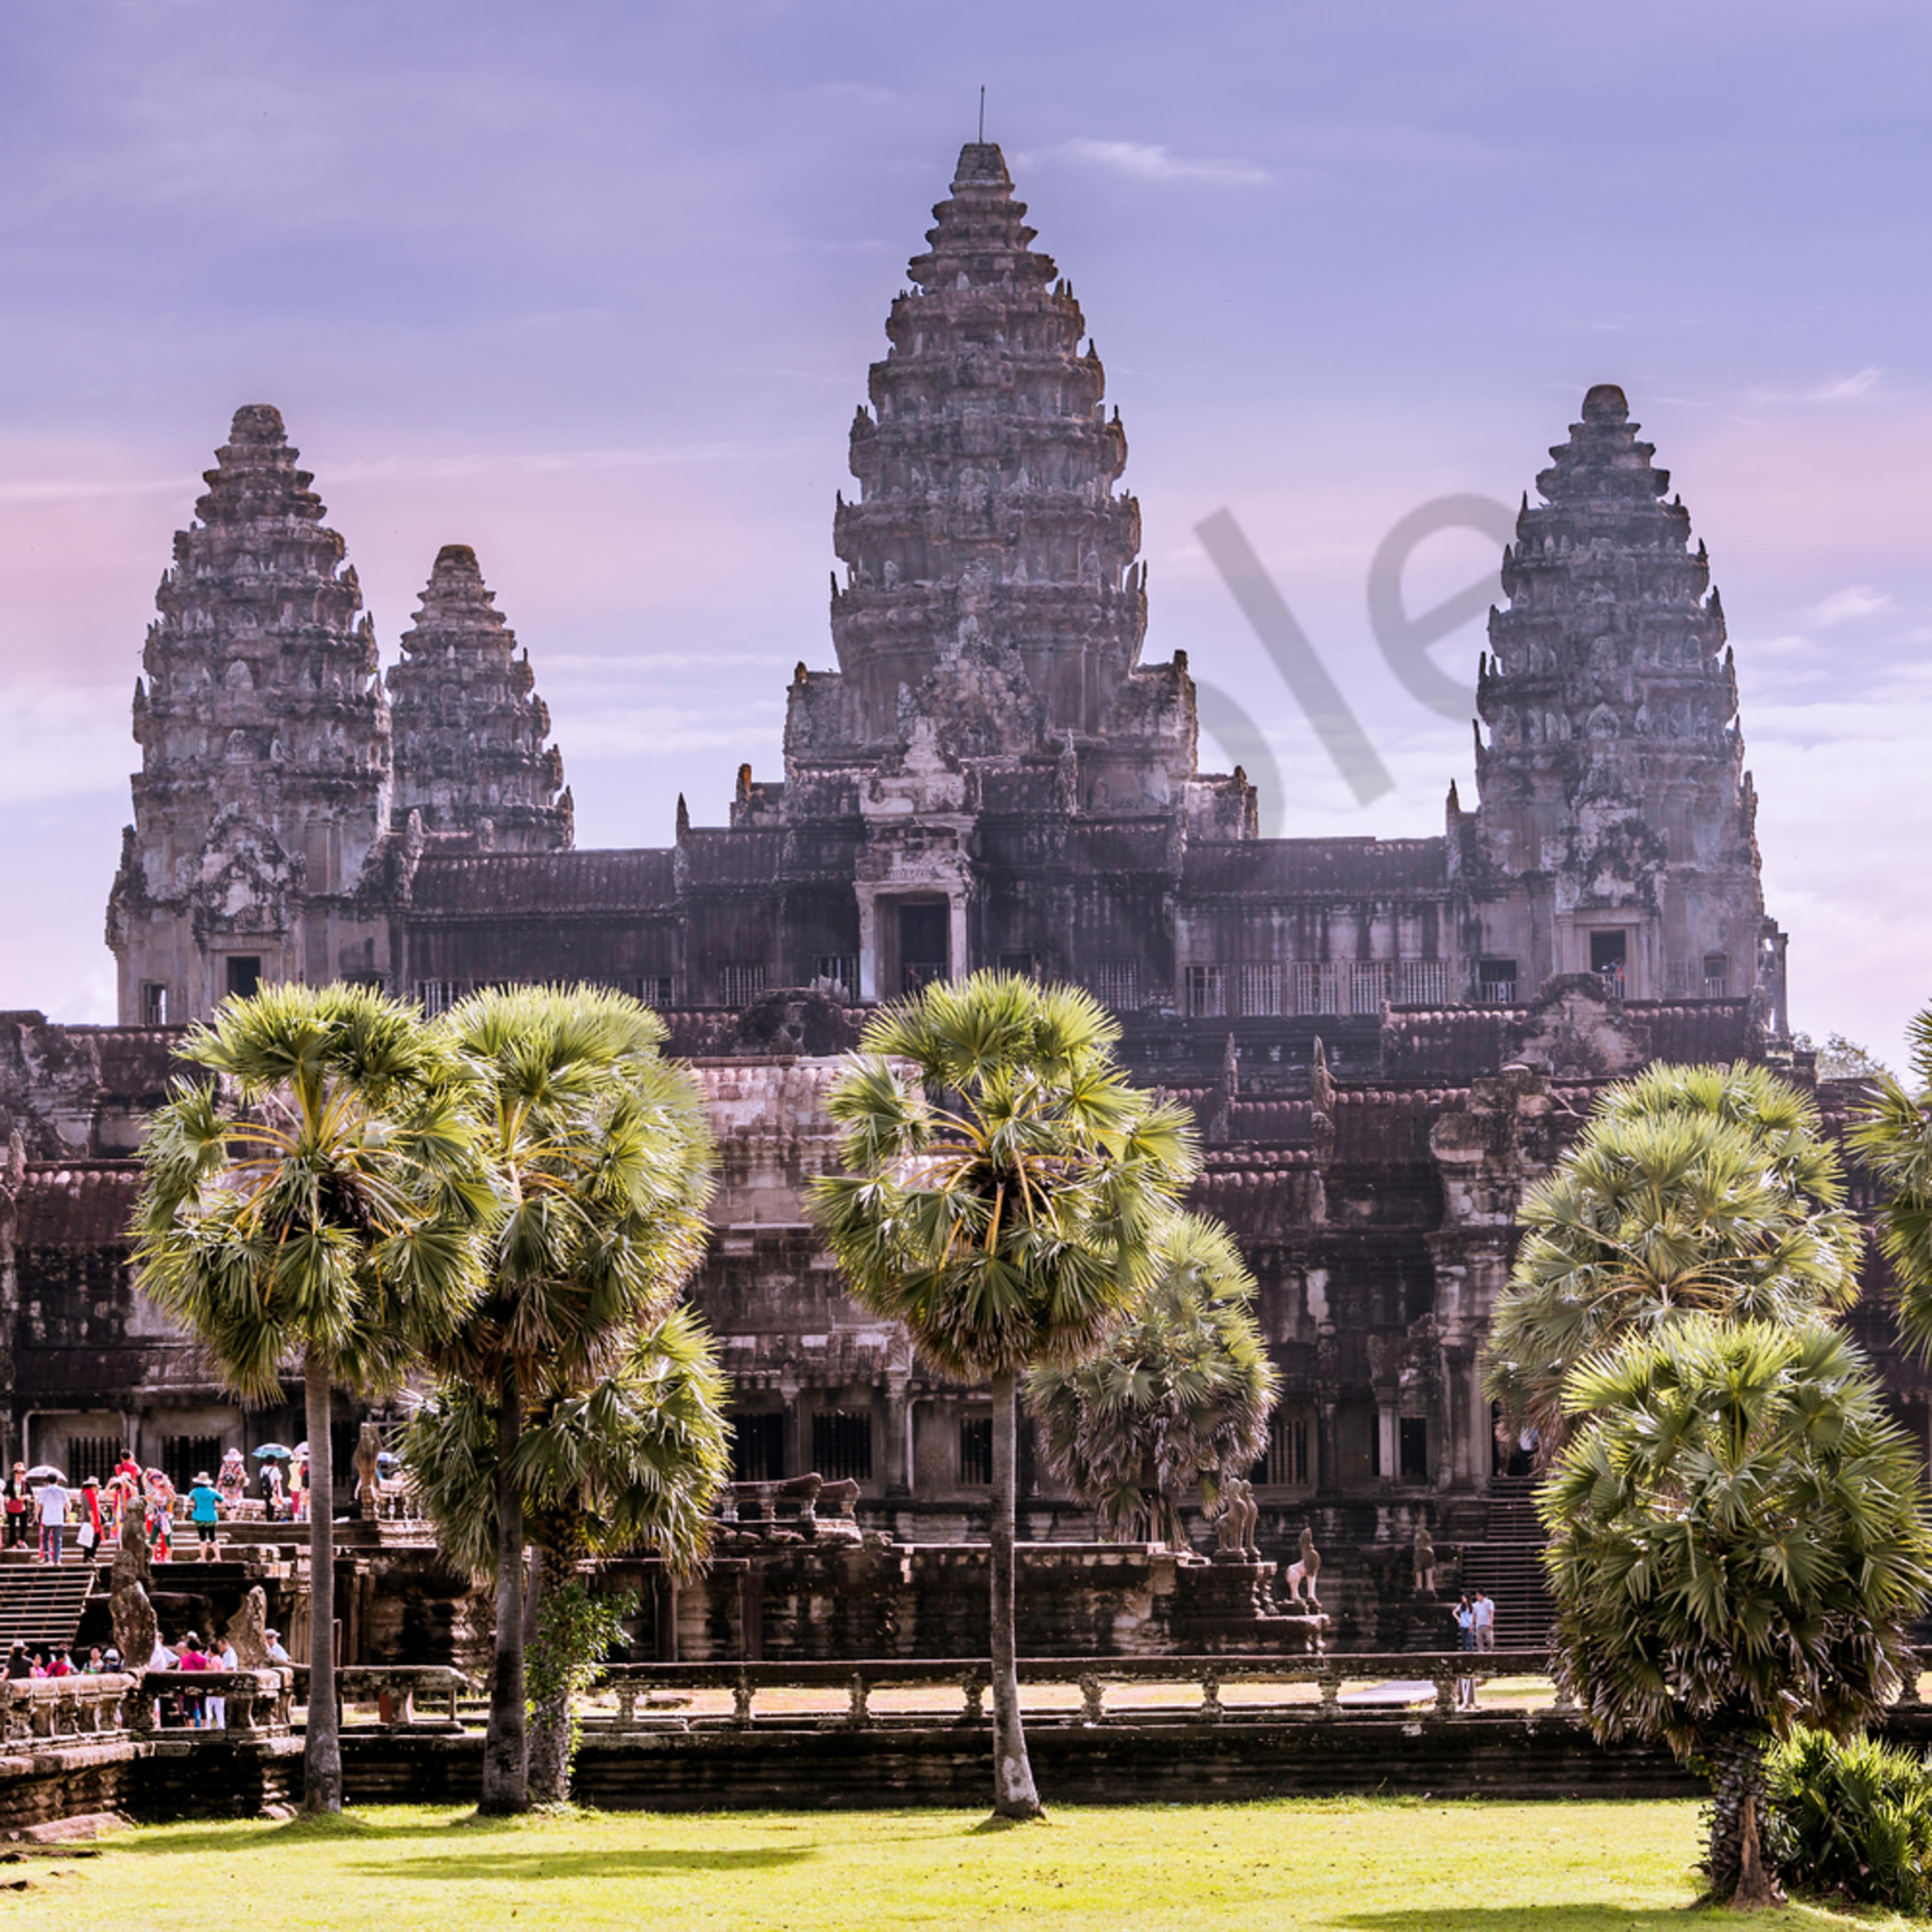 2016 10 15 cambodiadsc 1152 edit  up3hwr